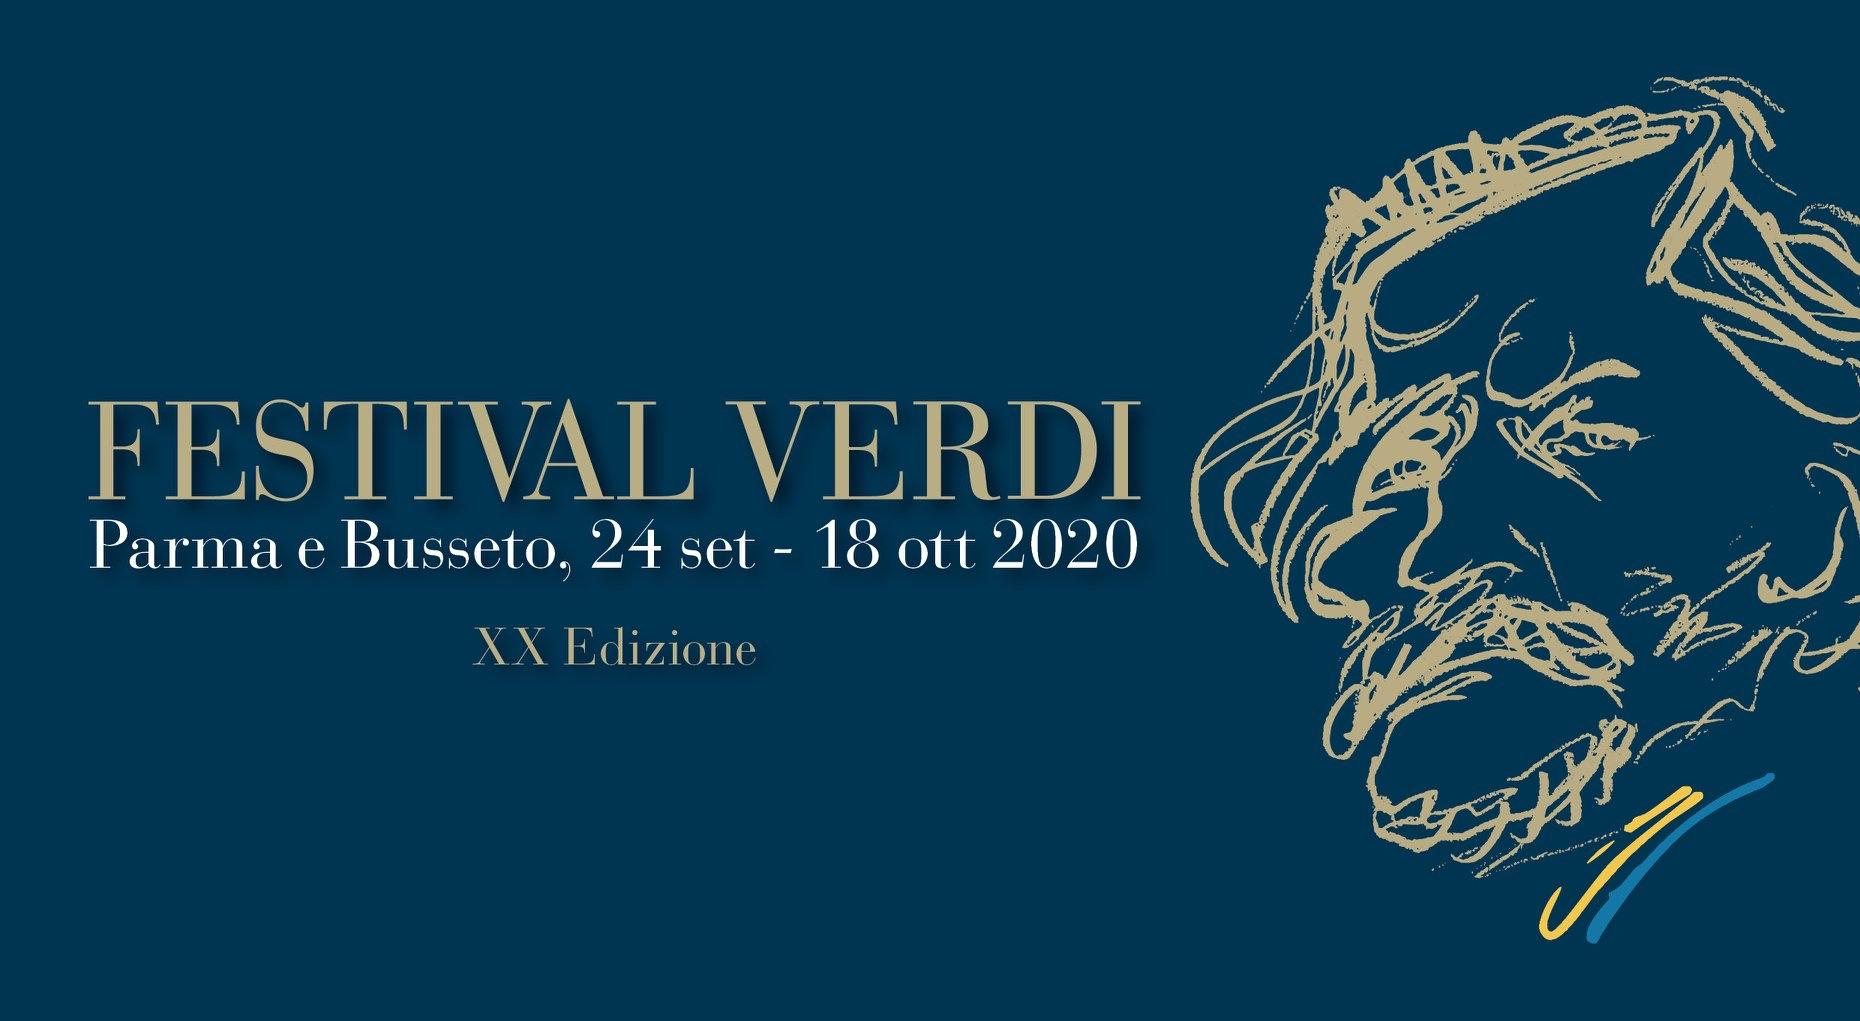 Festival Verdi 2020 - Parma e Busseto